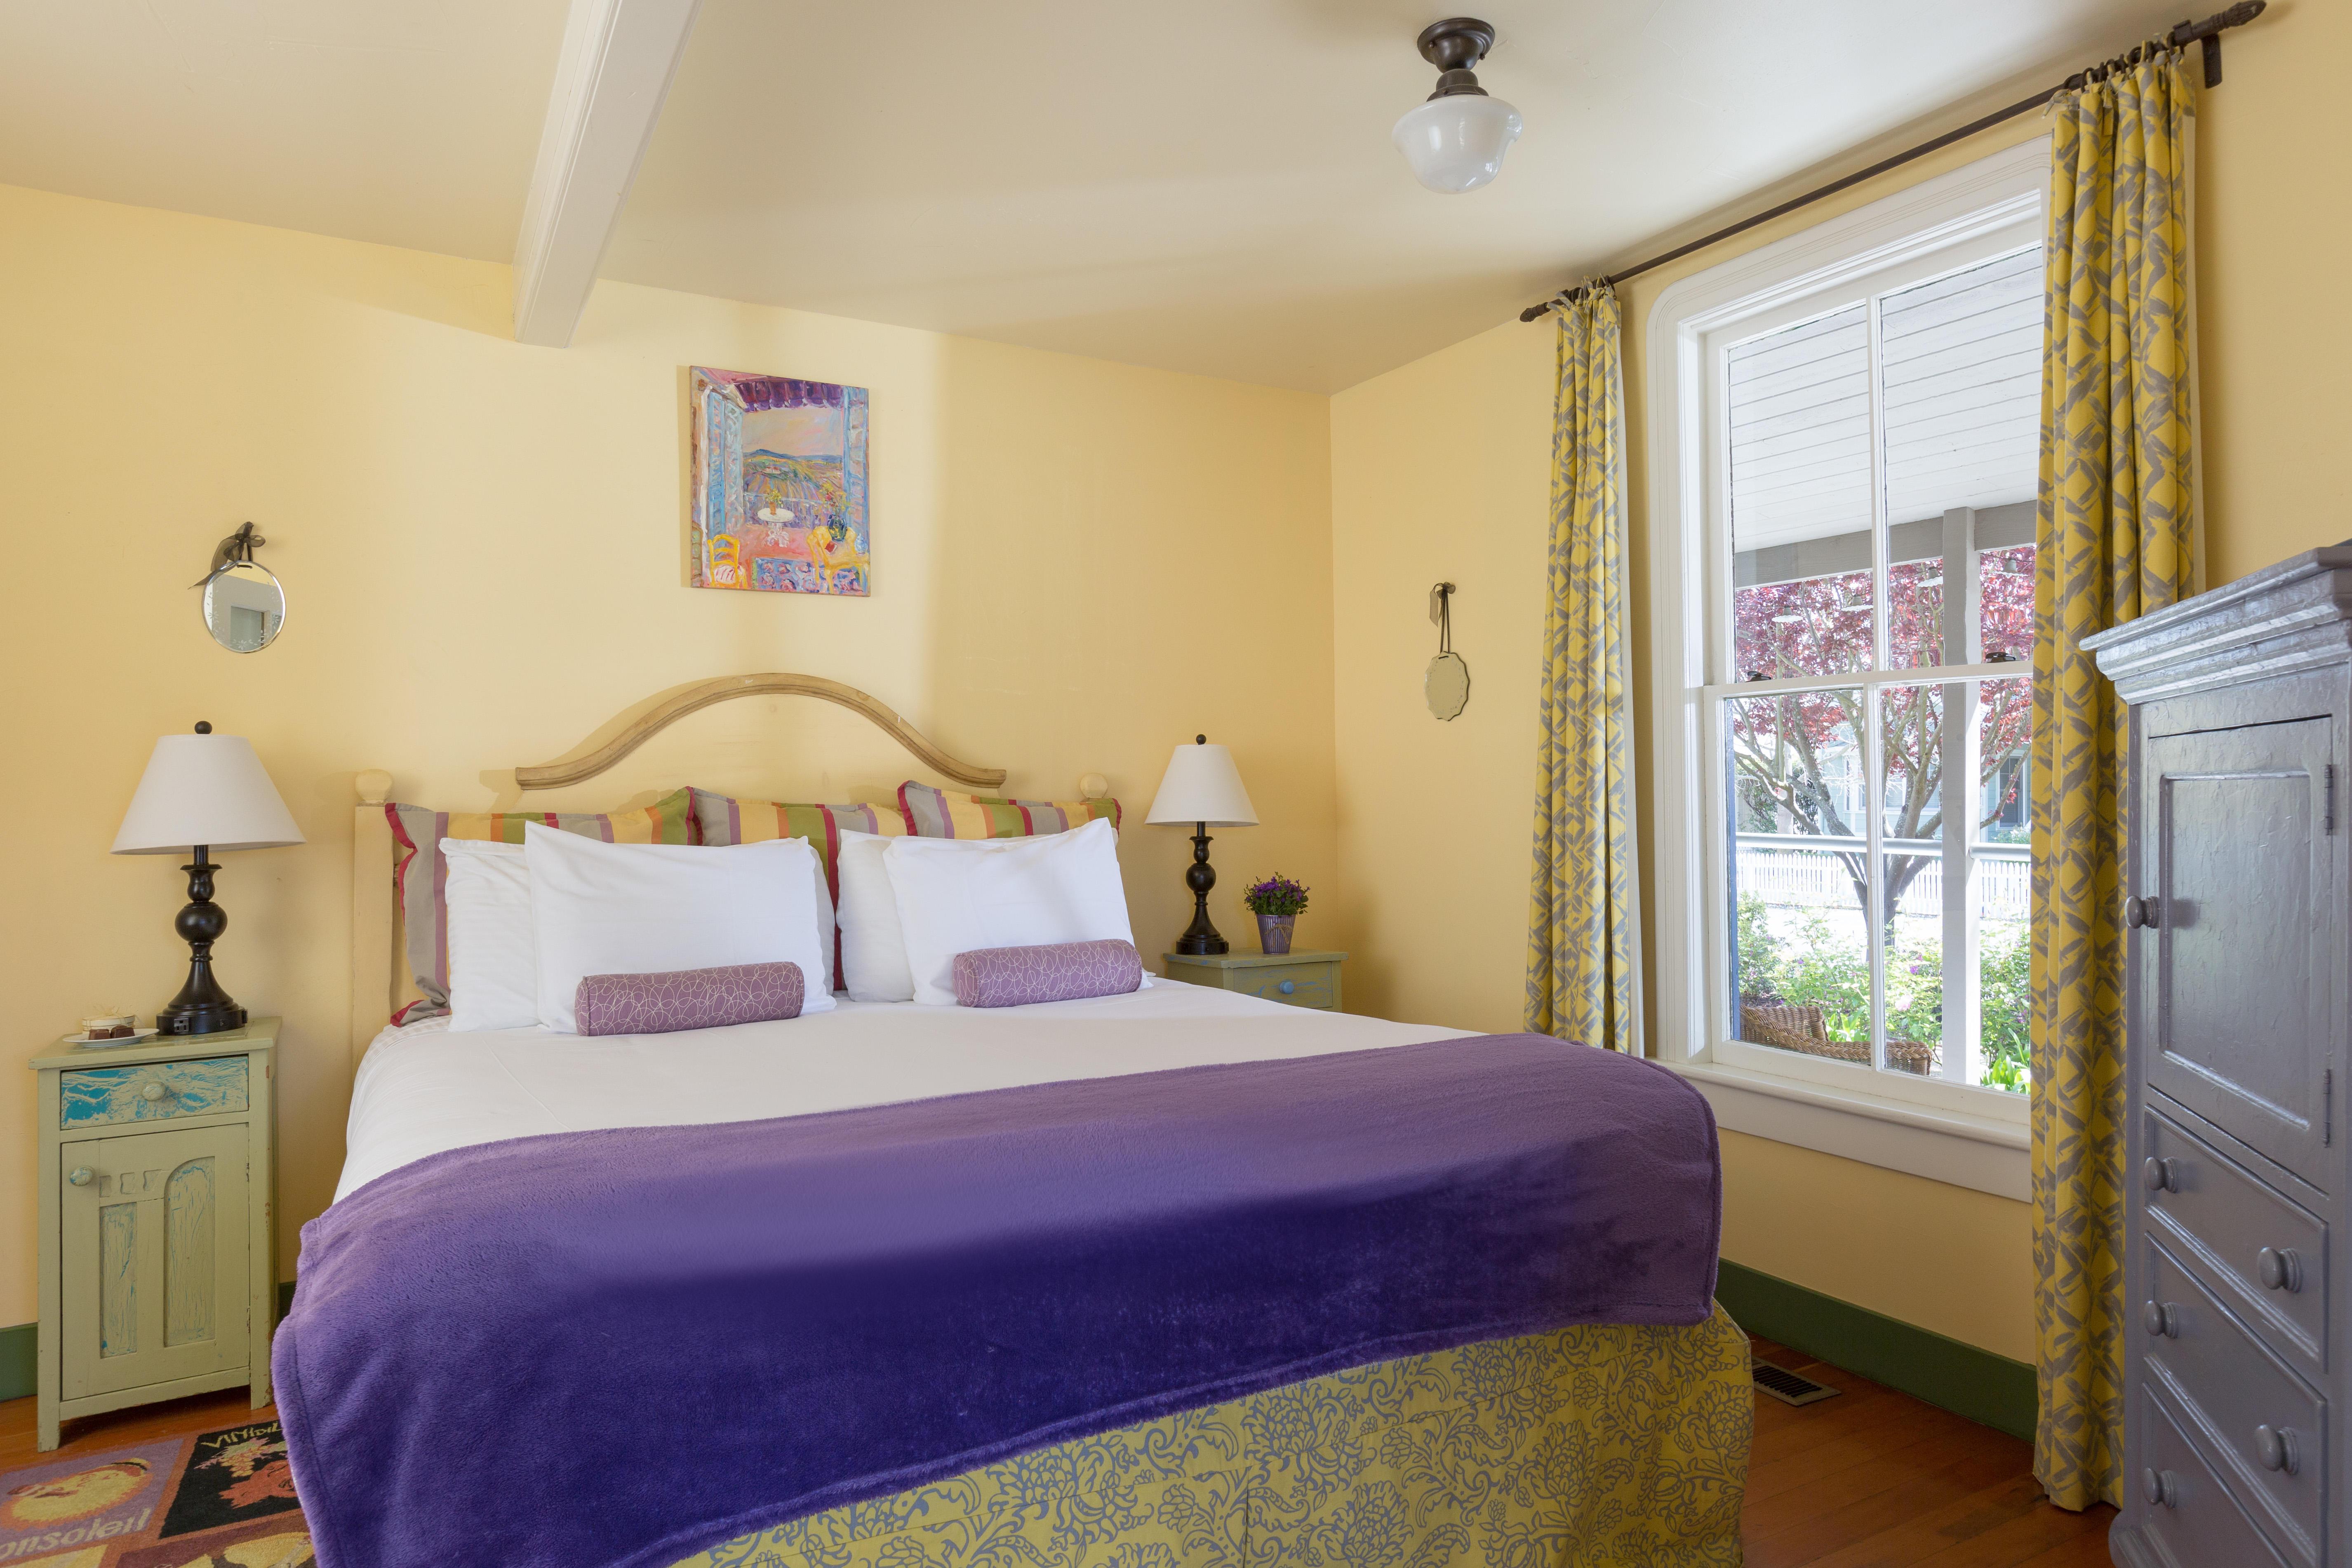 Lavender, A Four Sisters Inn image 3